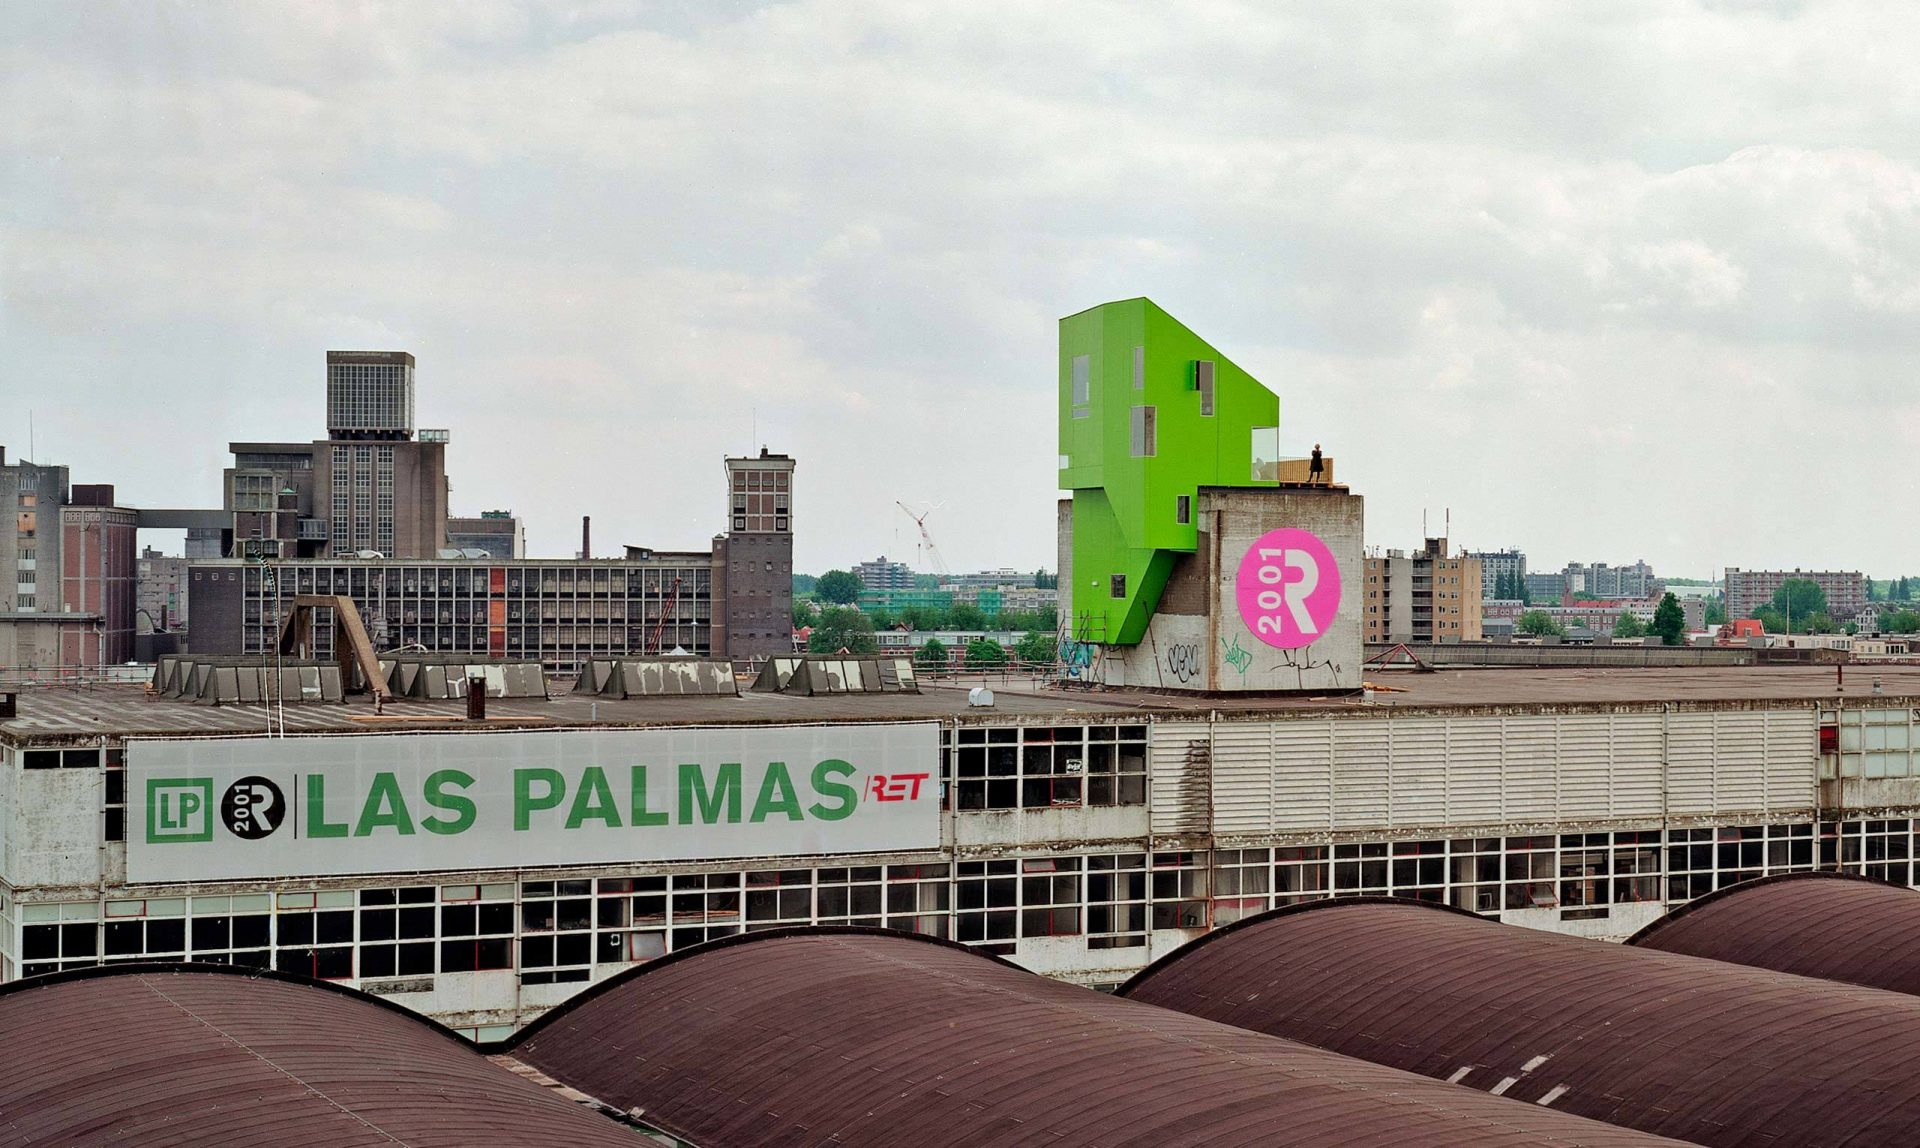 Palmas Roof View